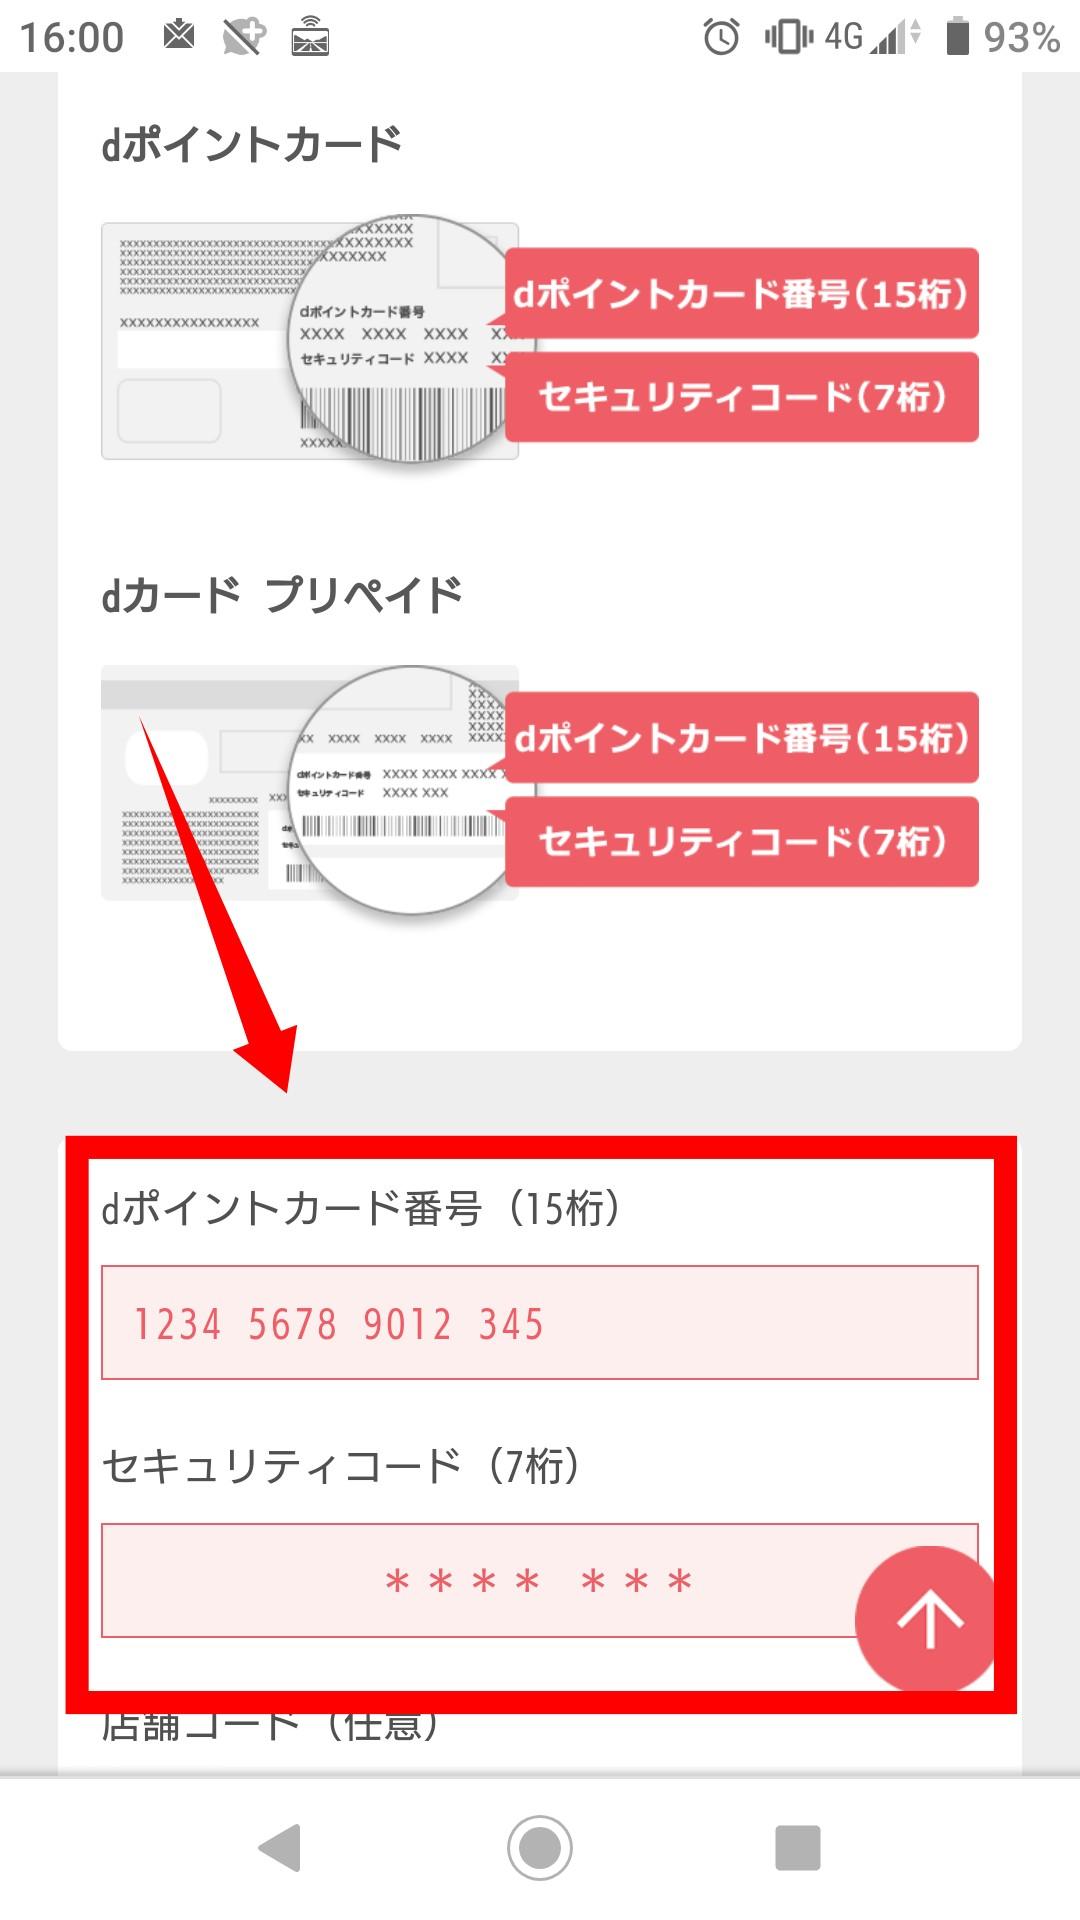 dポイントカードの利用情報登録の手順